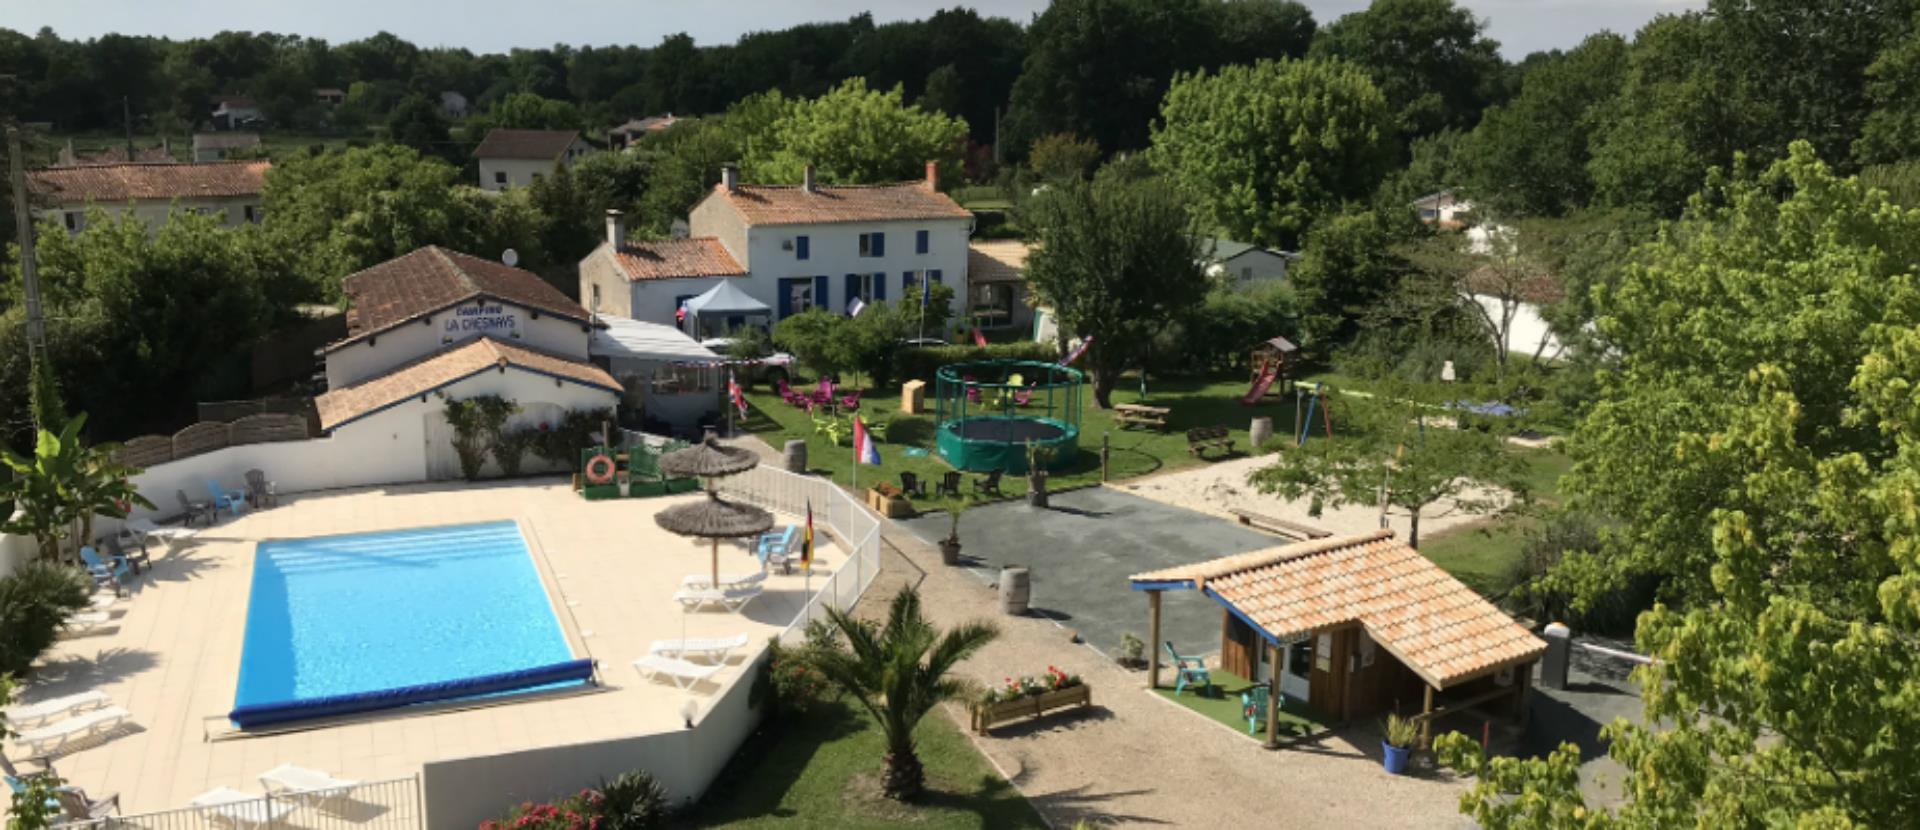 Camping la Chesnays, Vendays-Montalivet, Gironde